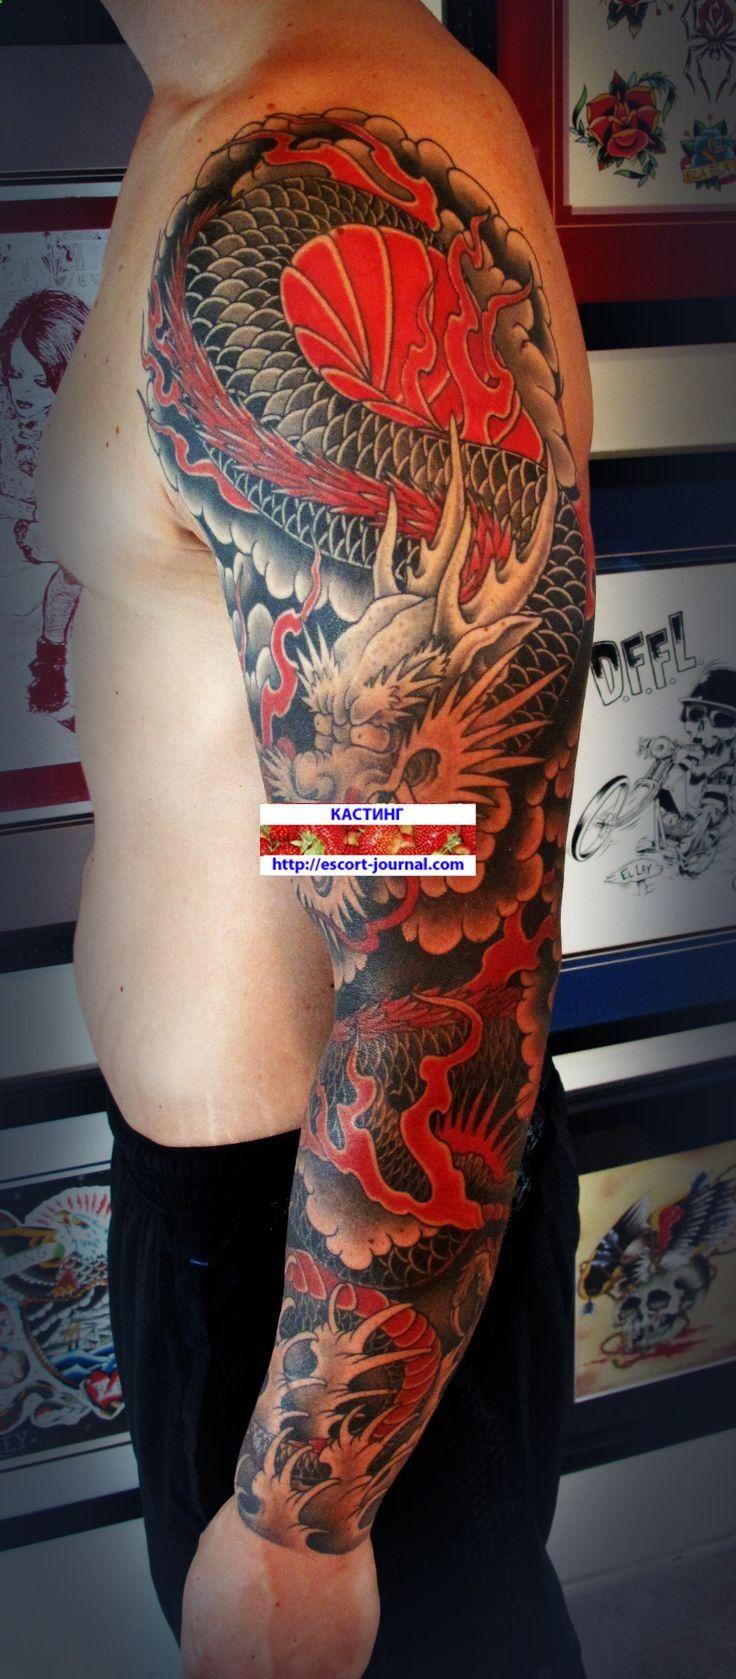 Fashion 2016 Japanese Dragon Tattoos | Dragon Sleeve « Saltwatertattoo .. Эскорт Работа Девушкам. Кастинг http://escort-journal.com/